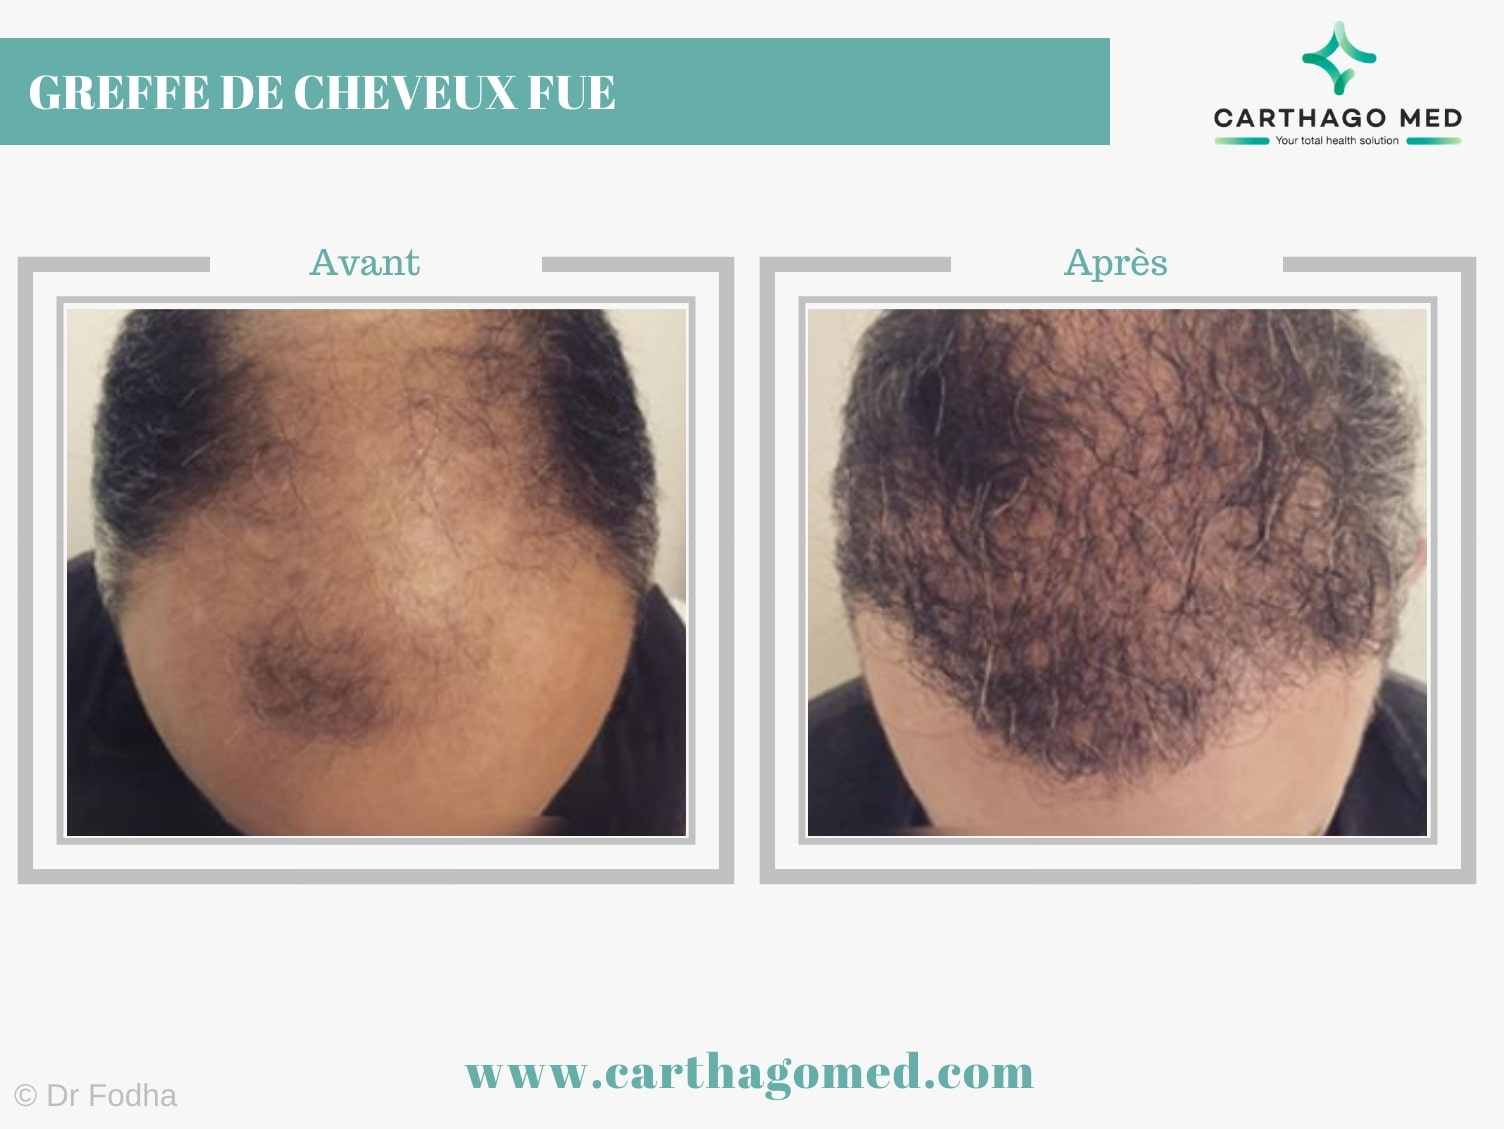 Greffe de cheveux FUE Carthago Med min (3)